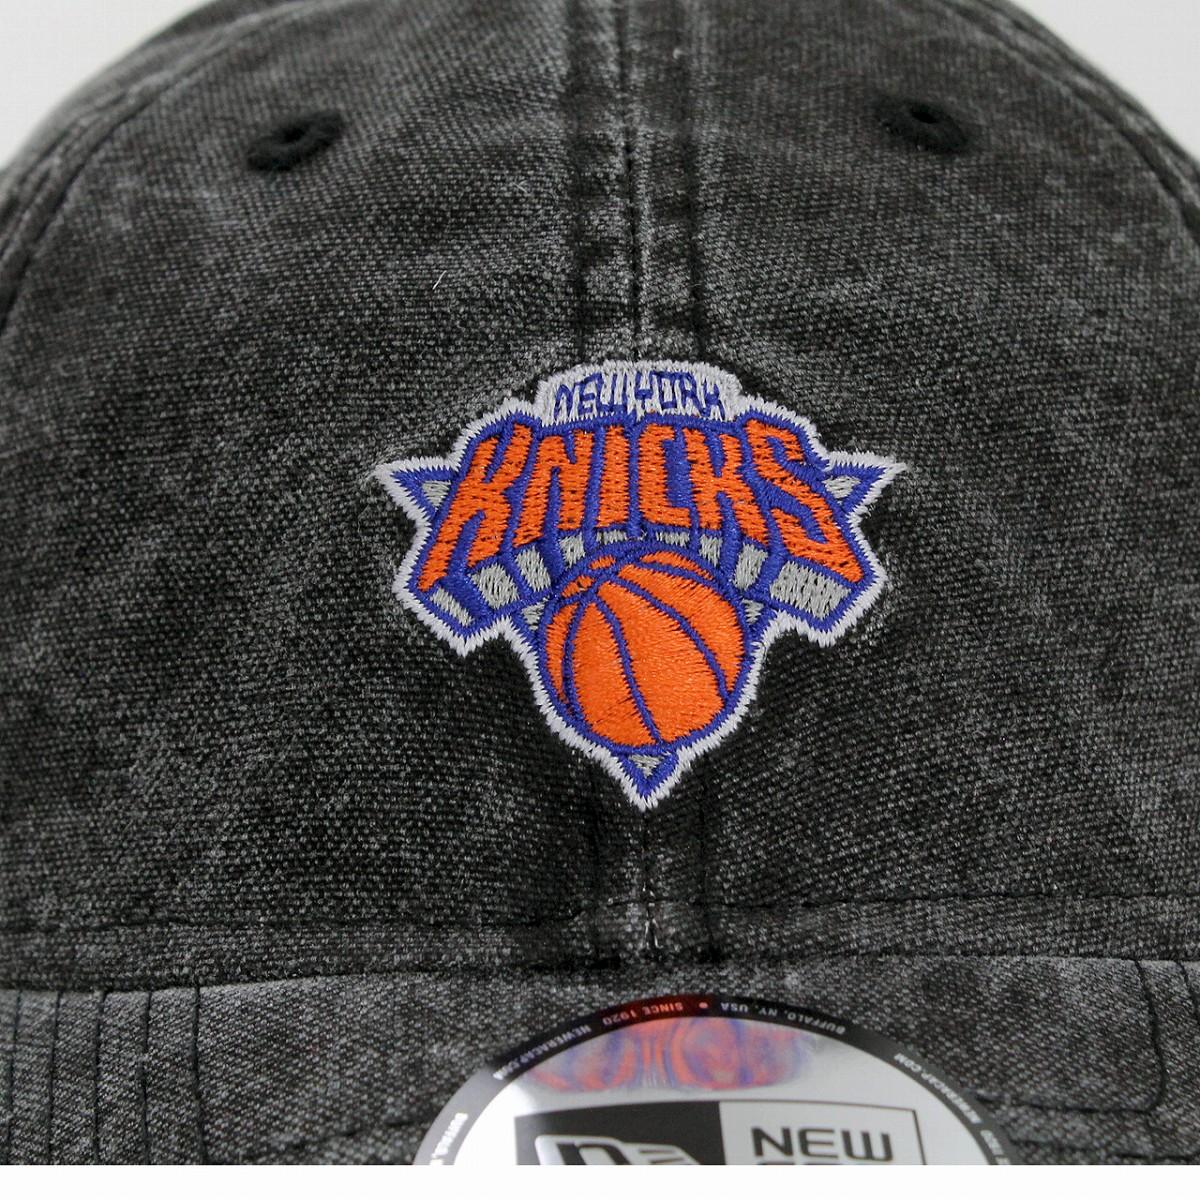 d164b59c60e New gills cap NBA Italian wash duck canvas New York Knicks NY 9THIRTY hat  NEWYORK KNICKS NEWERA black black baseball cap men street brand fashion   baseball ...